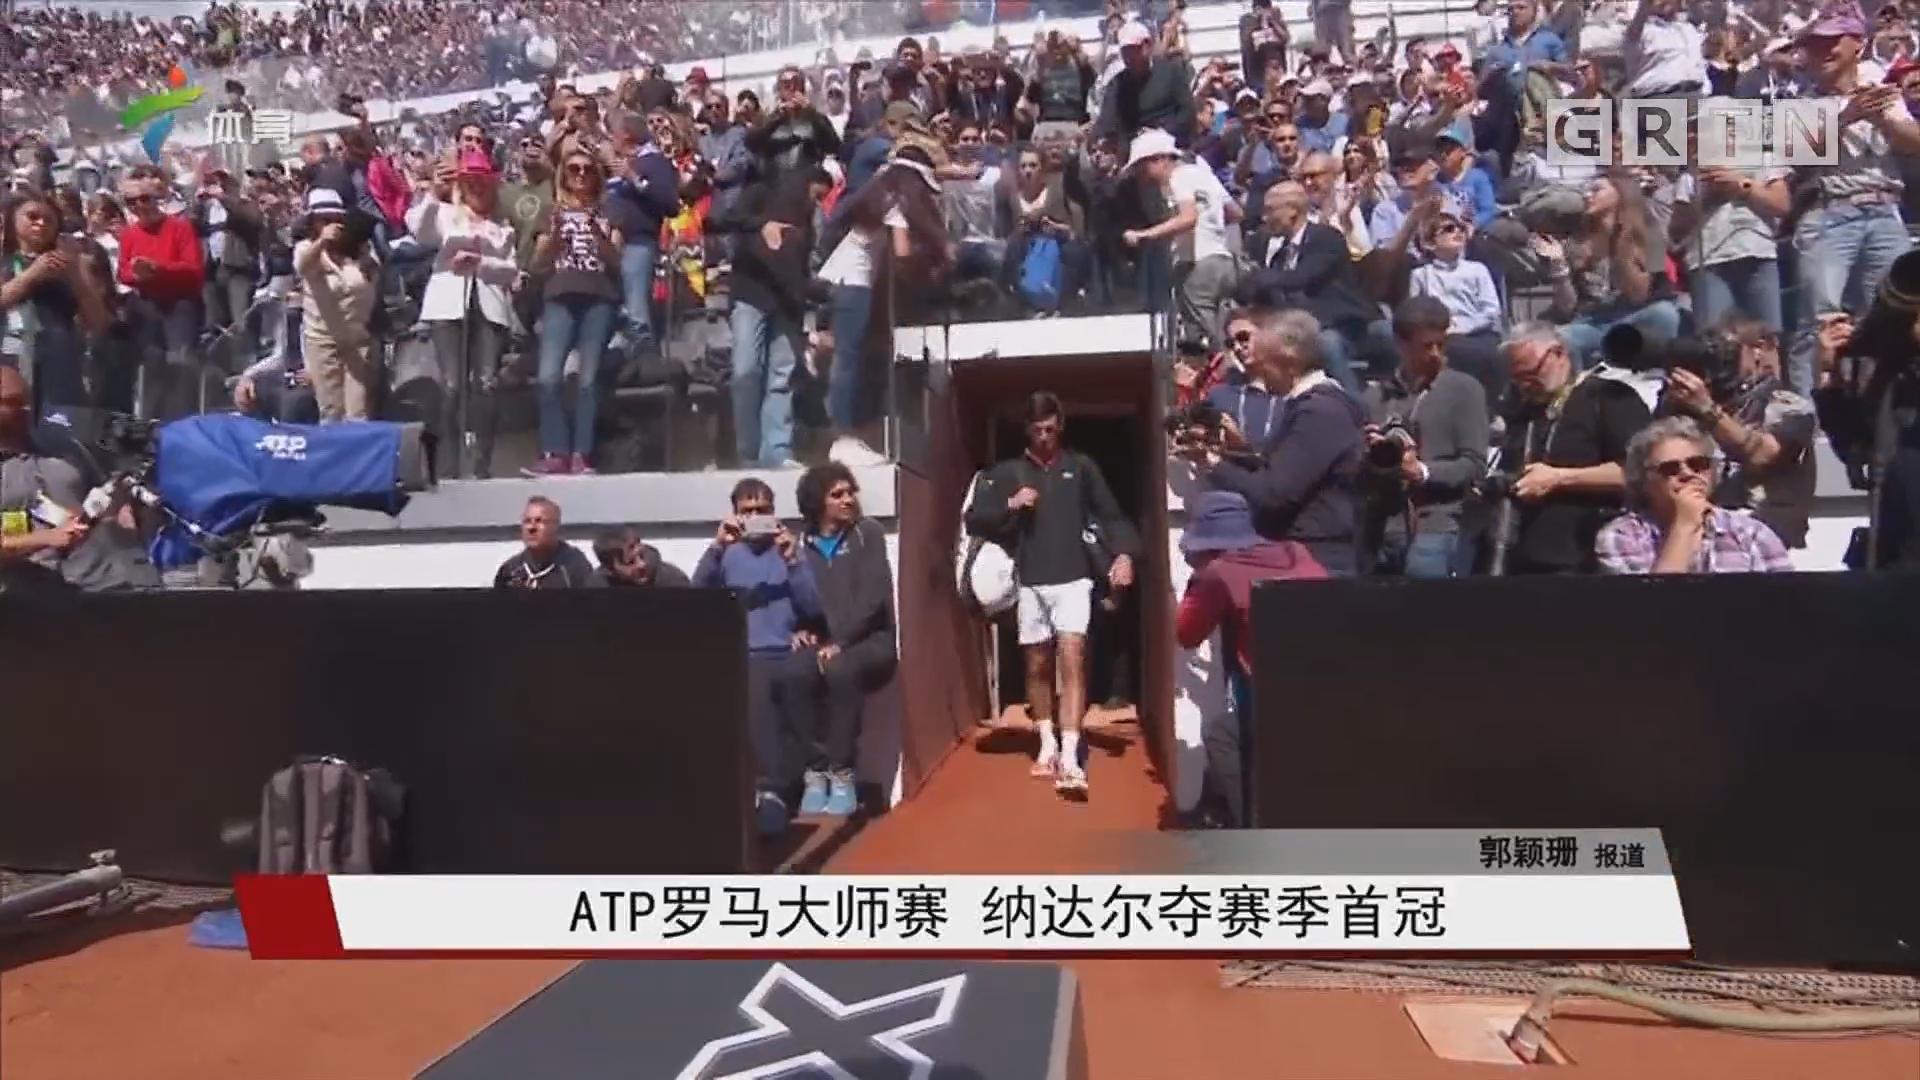 ATP罗马大师赛 纳达尔夺赛季首冠